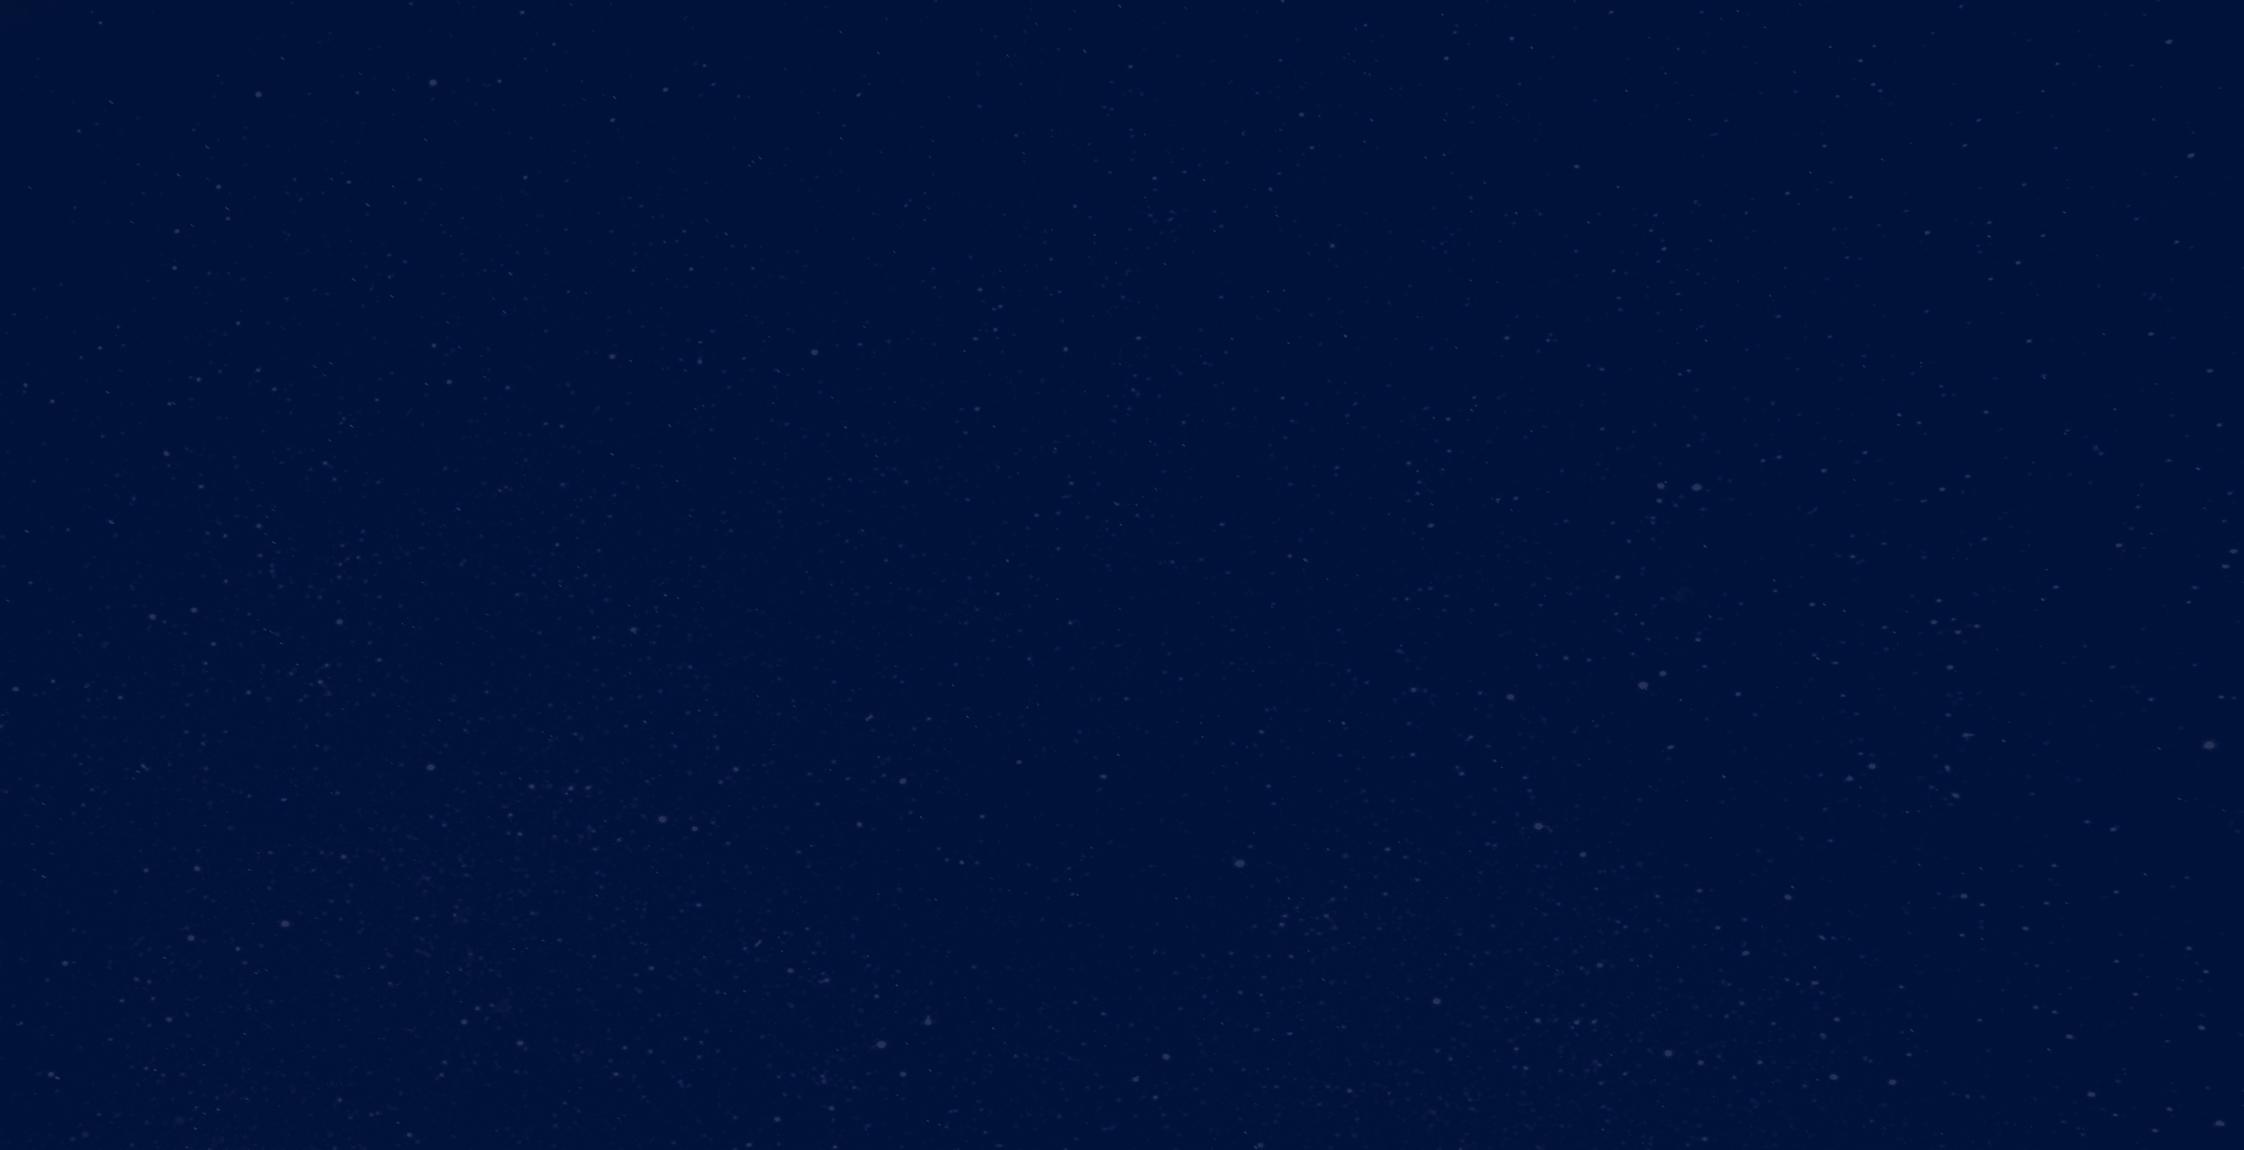 cielo stellato rielab mr 1